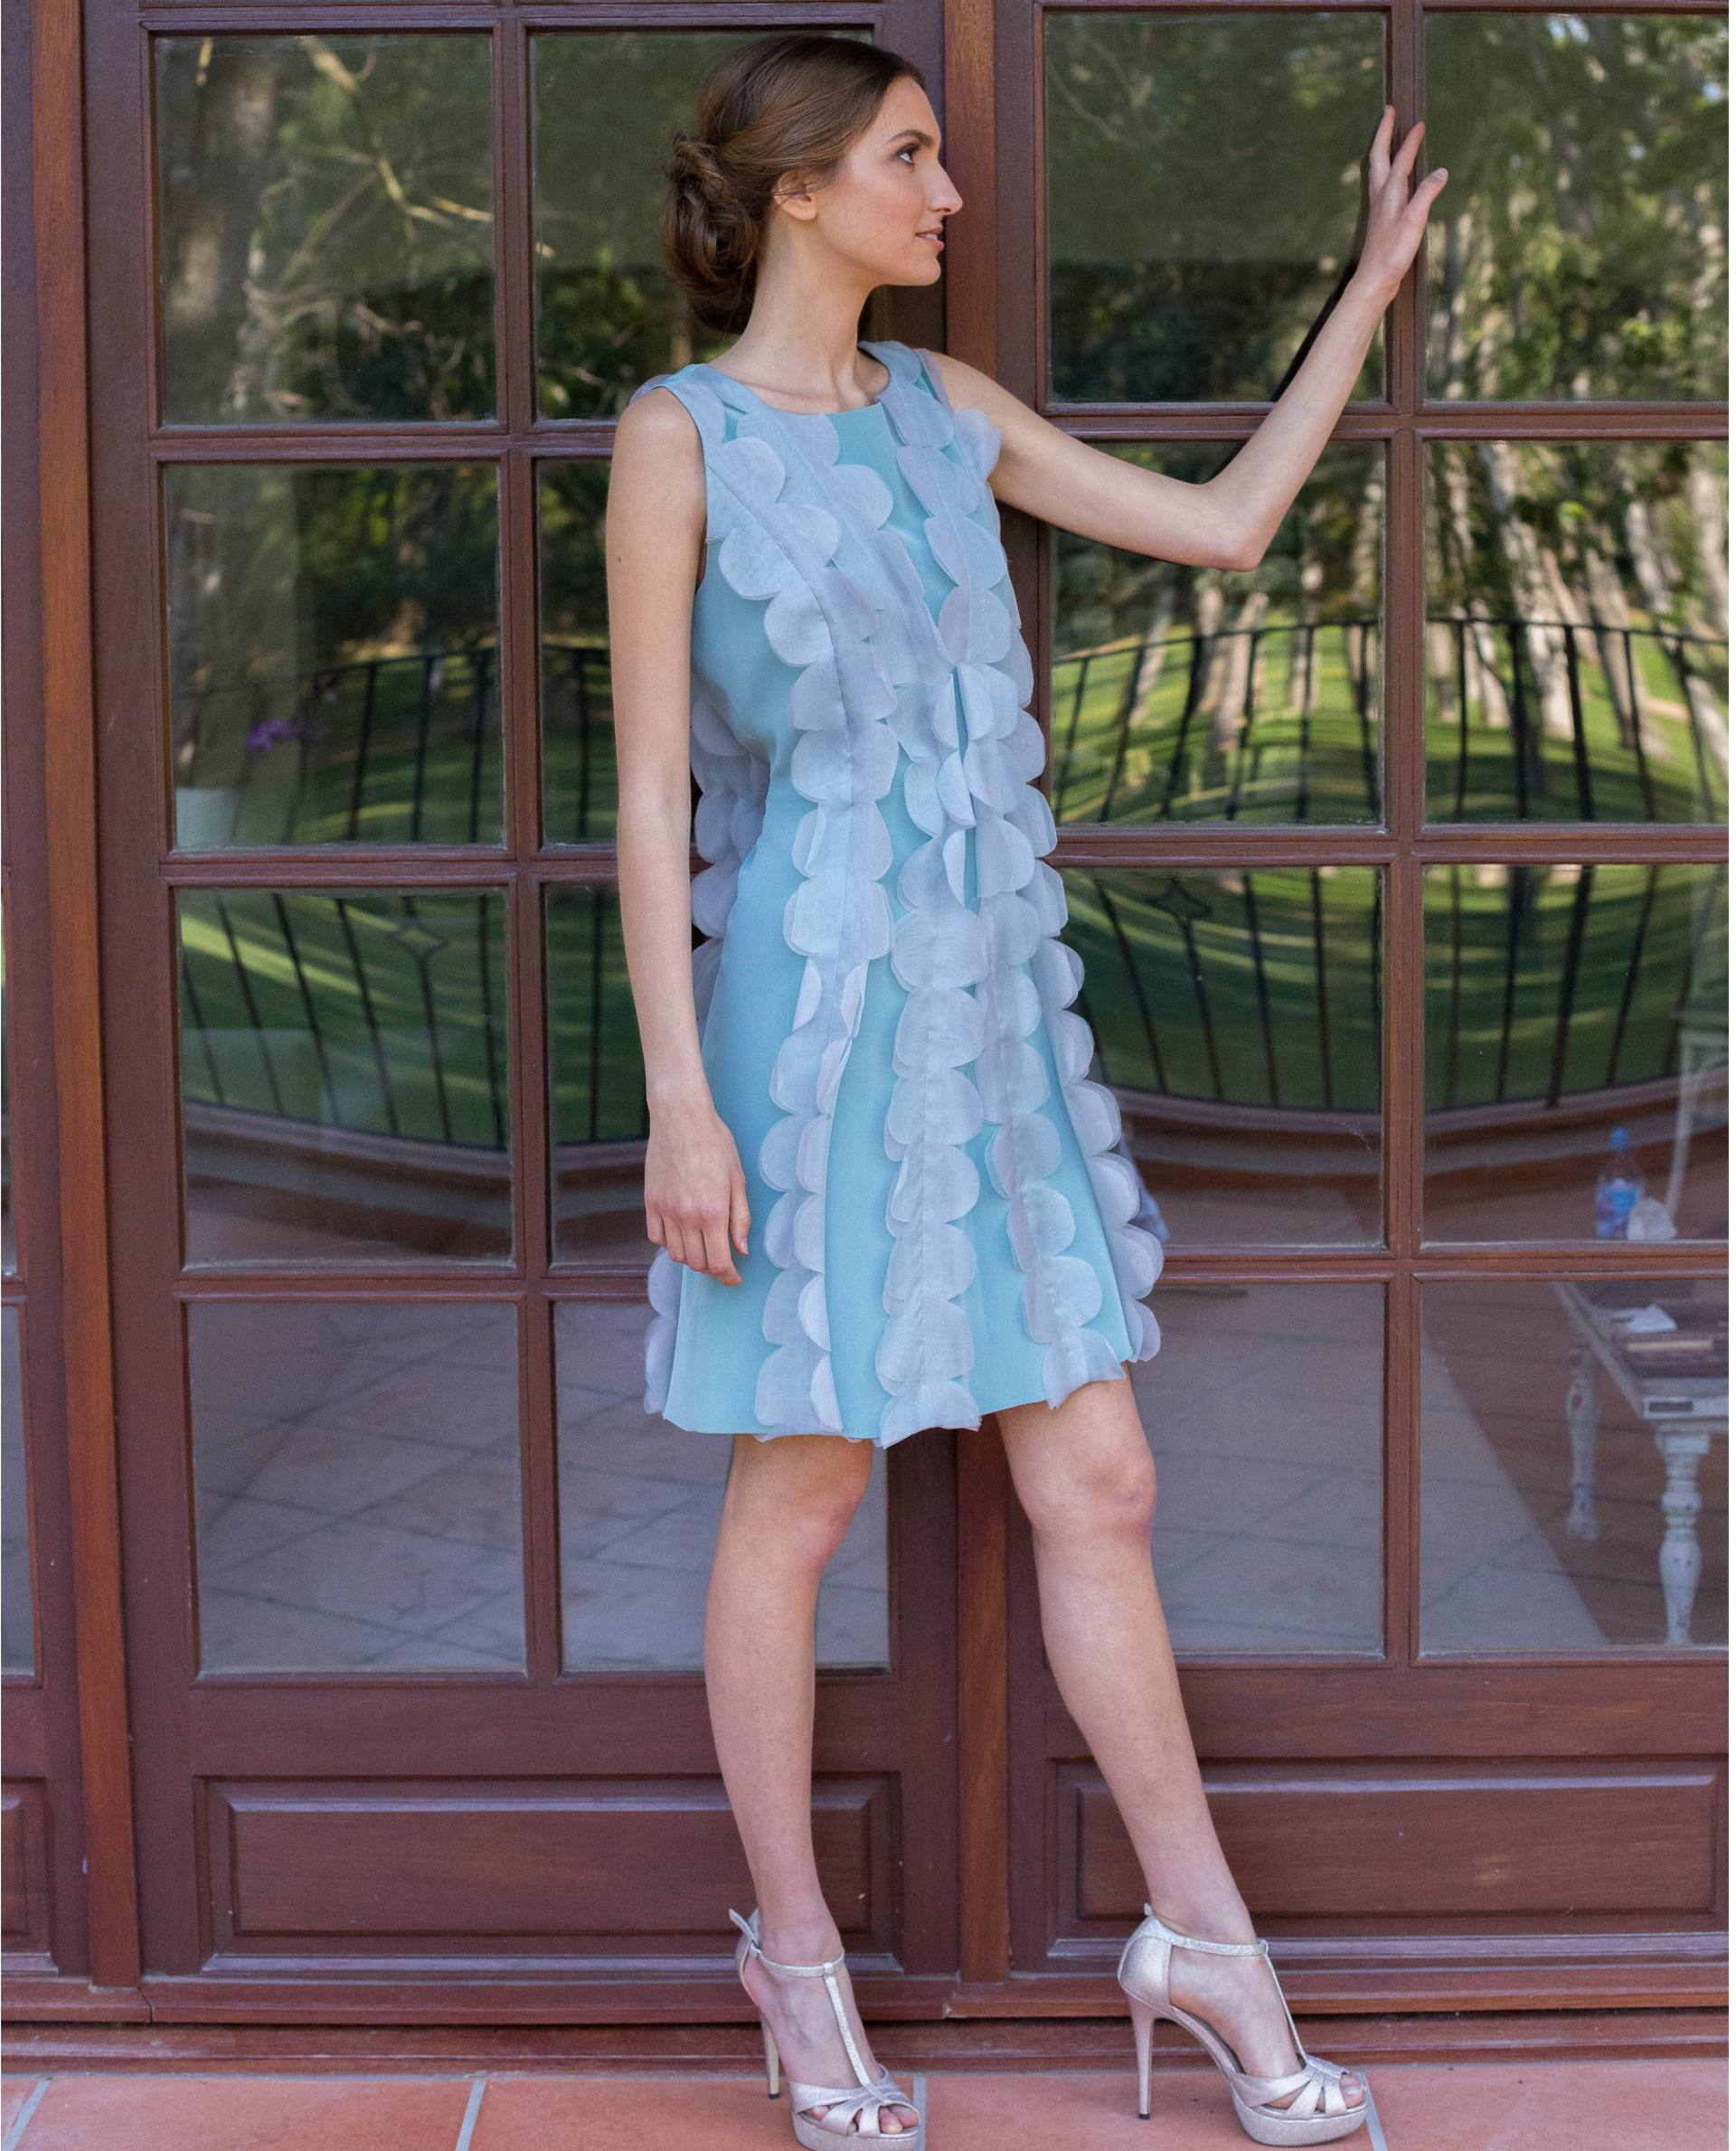 ATELIER-NATURE 2018/19 - VESTIDOS - vestido fiesta VALERIA azul